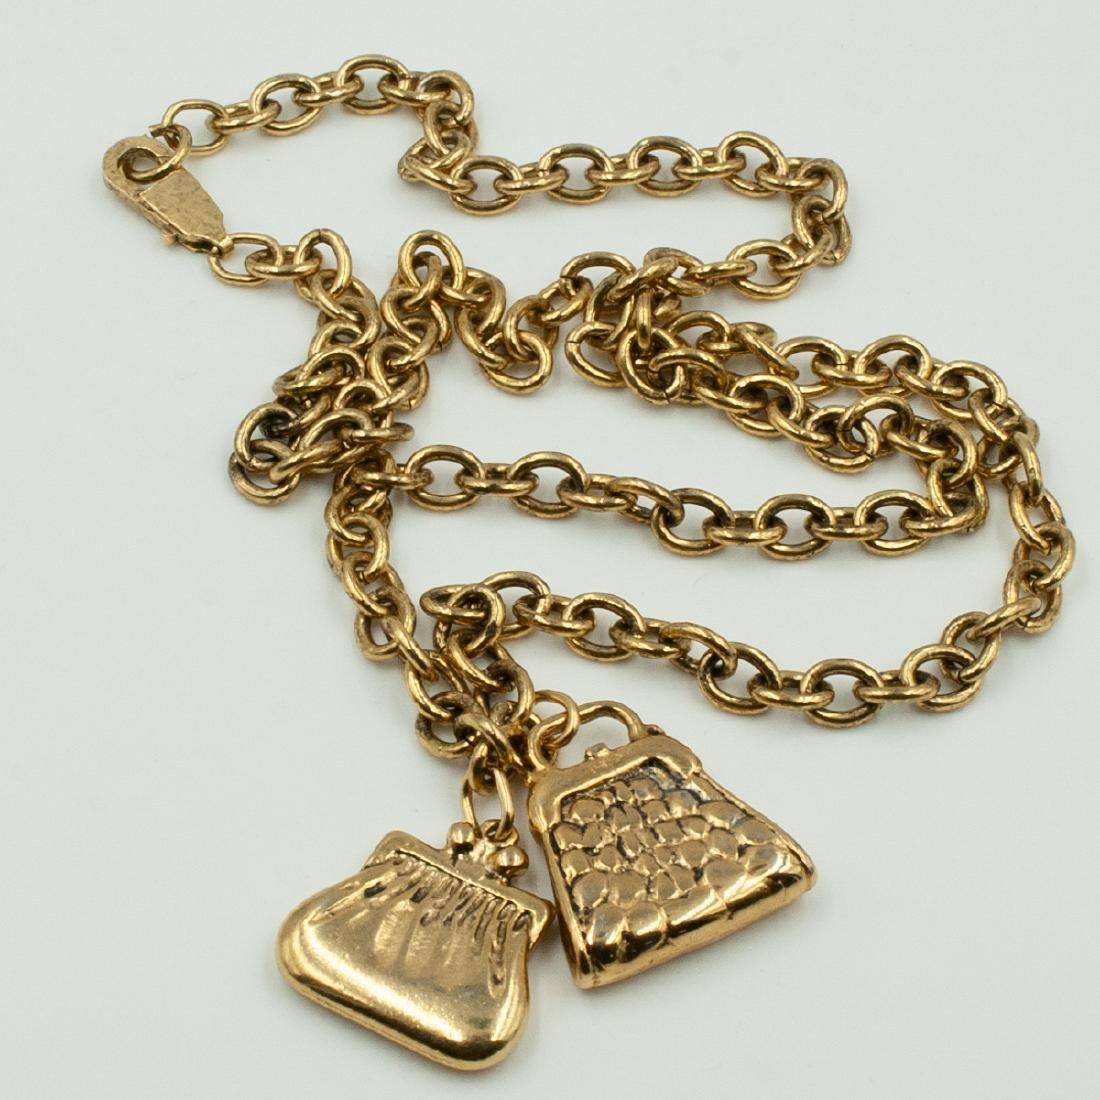 Costume Jewelry Purse Chain